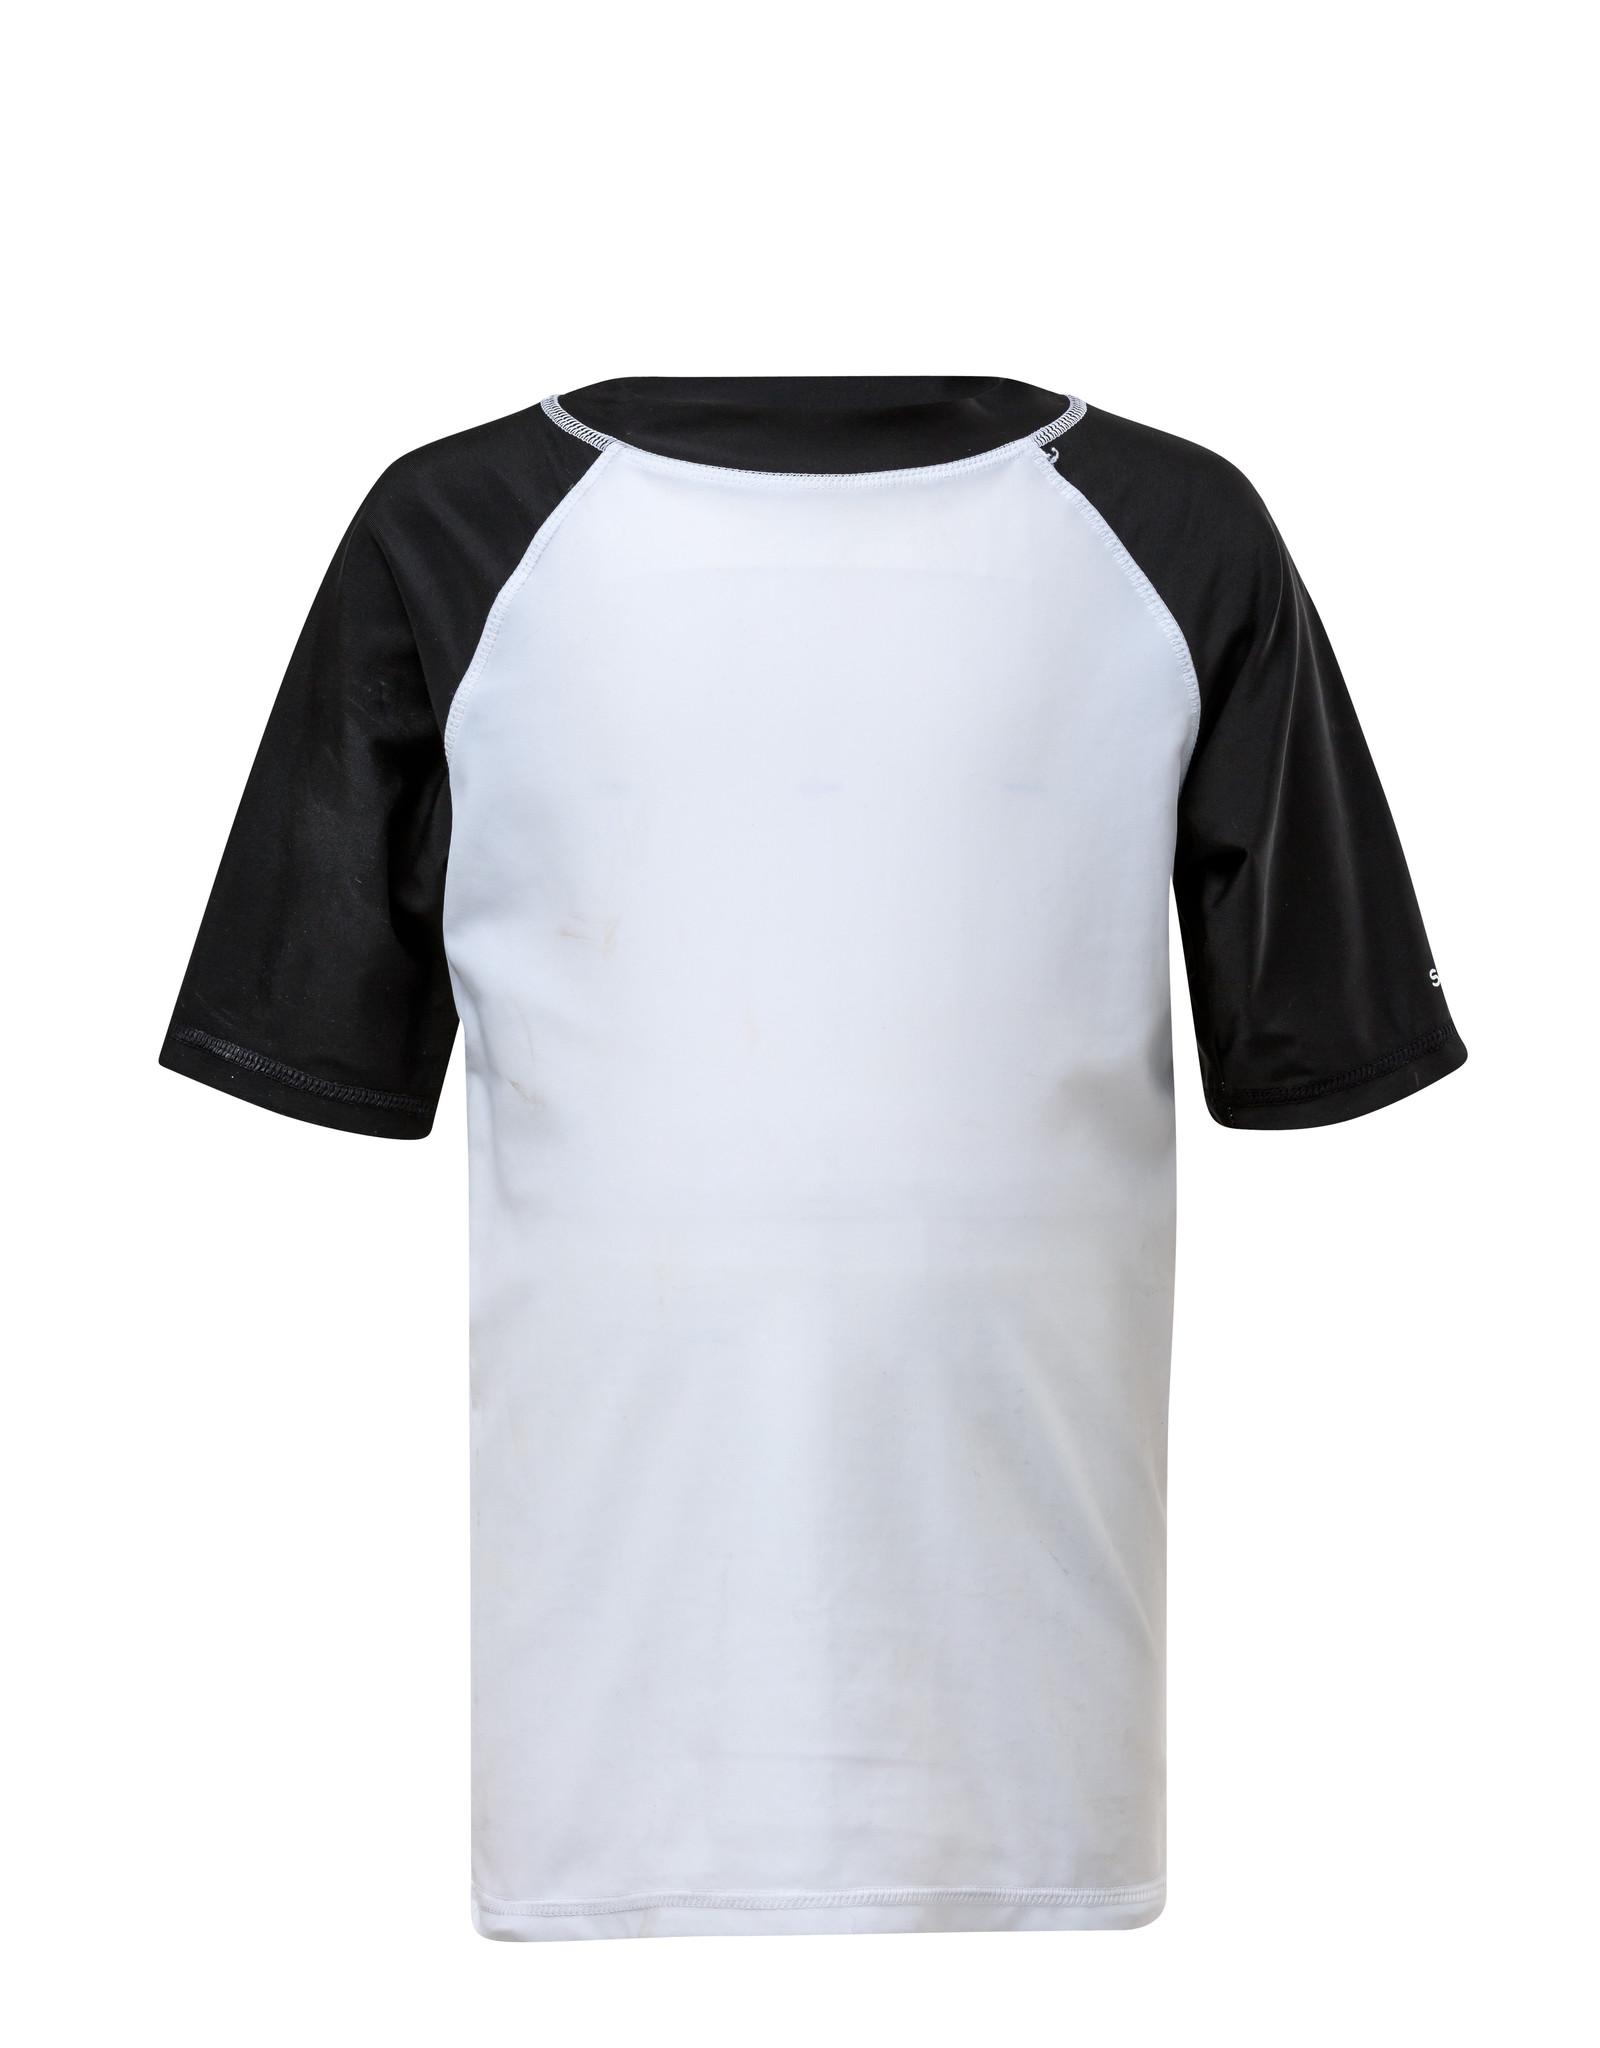 WHITE/BLACK SHORT SLEEVE RASH TOP